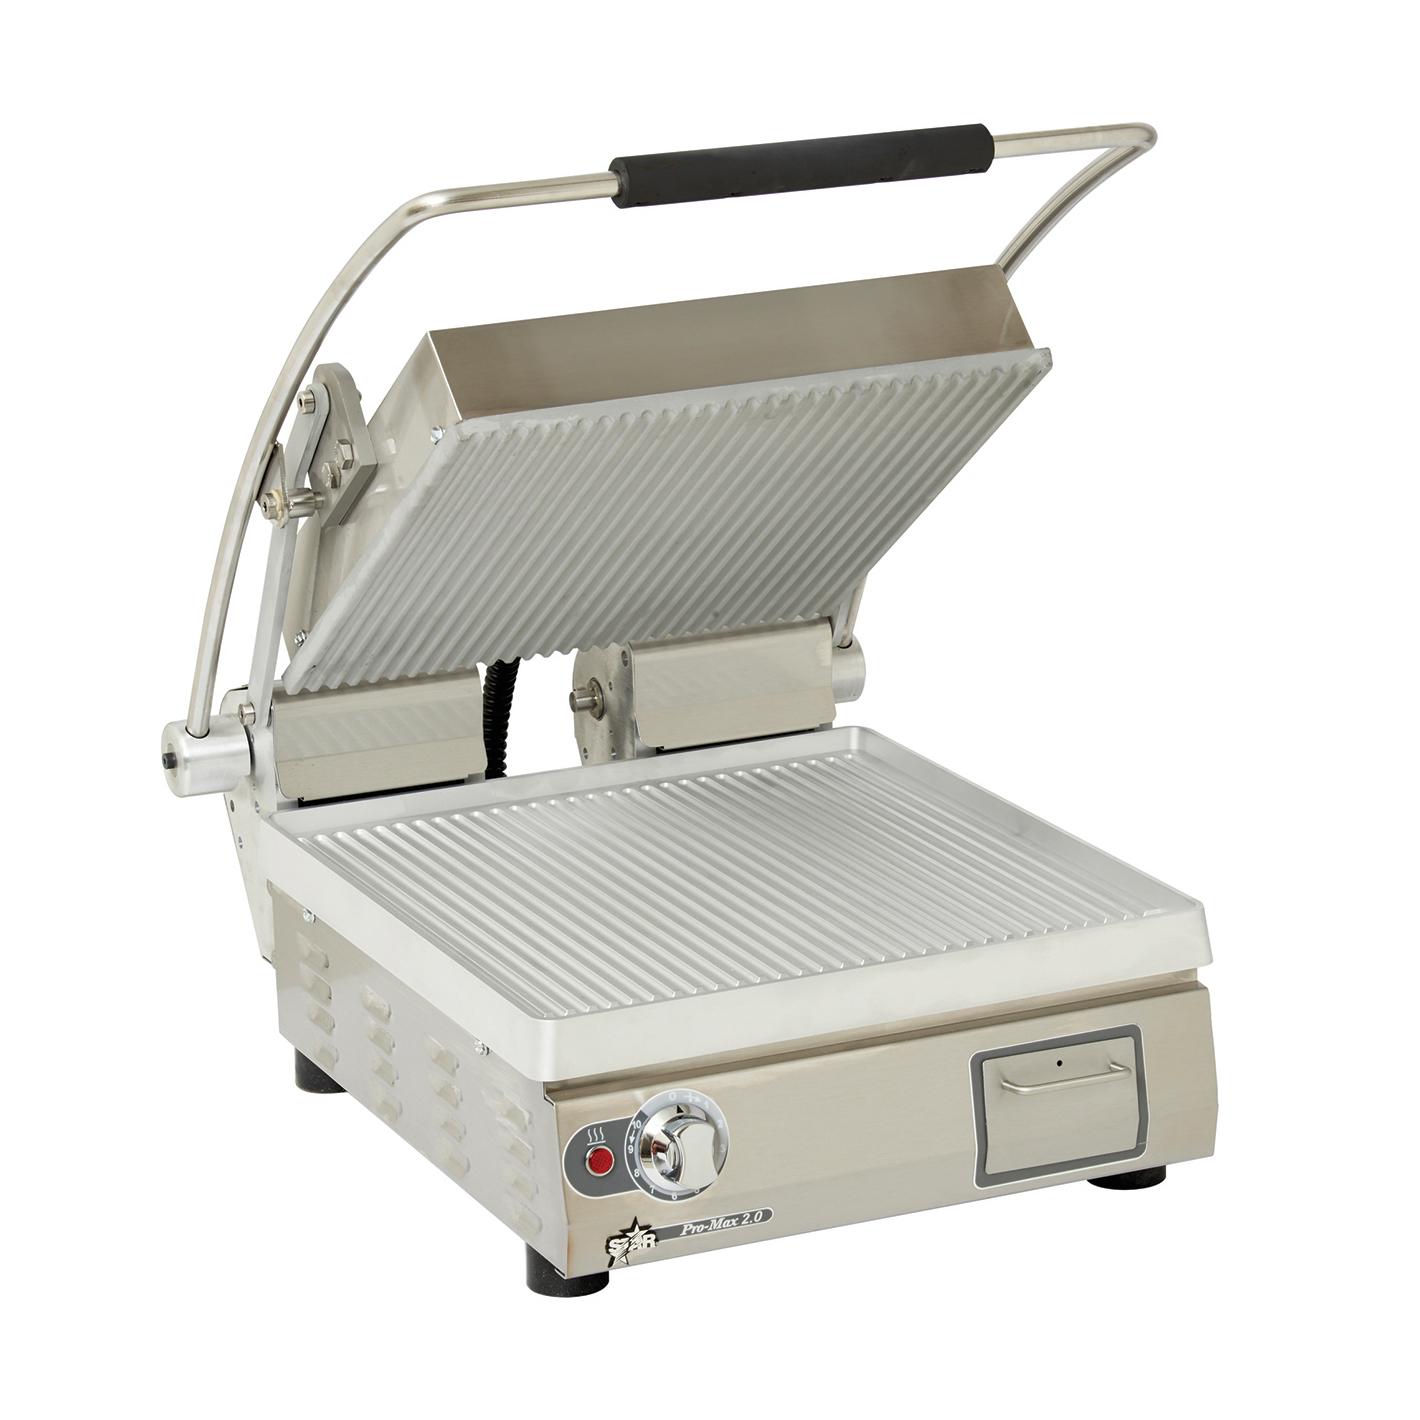 Star PGT14 sandwich / panini grill